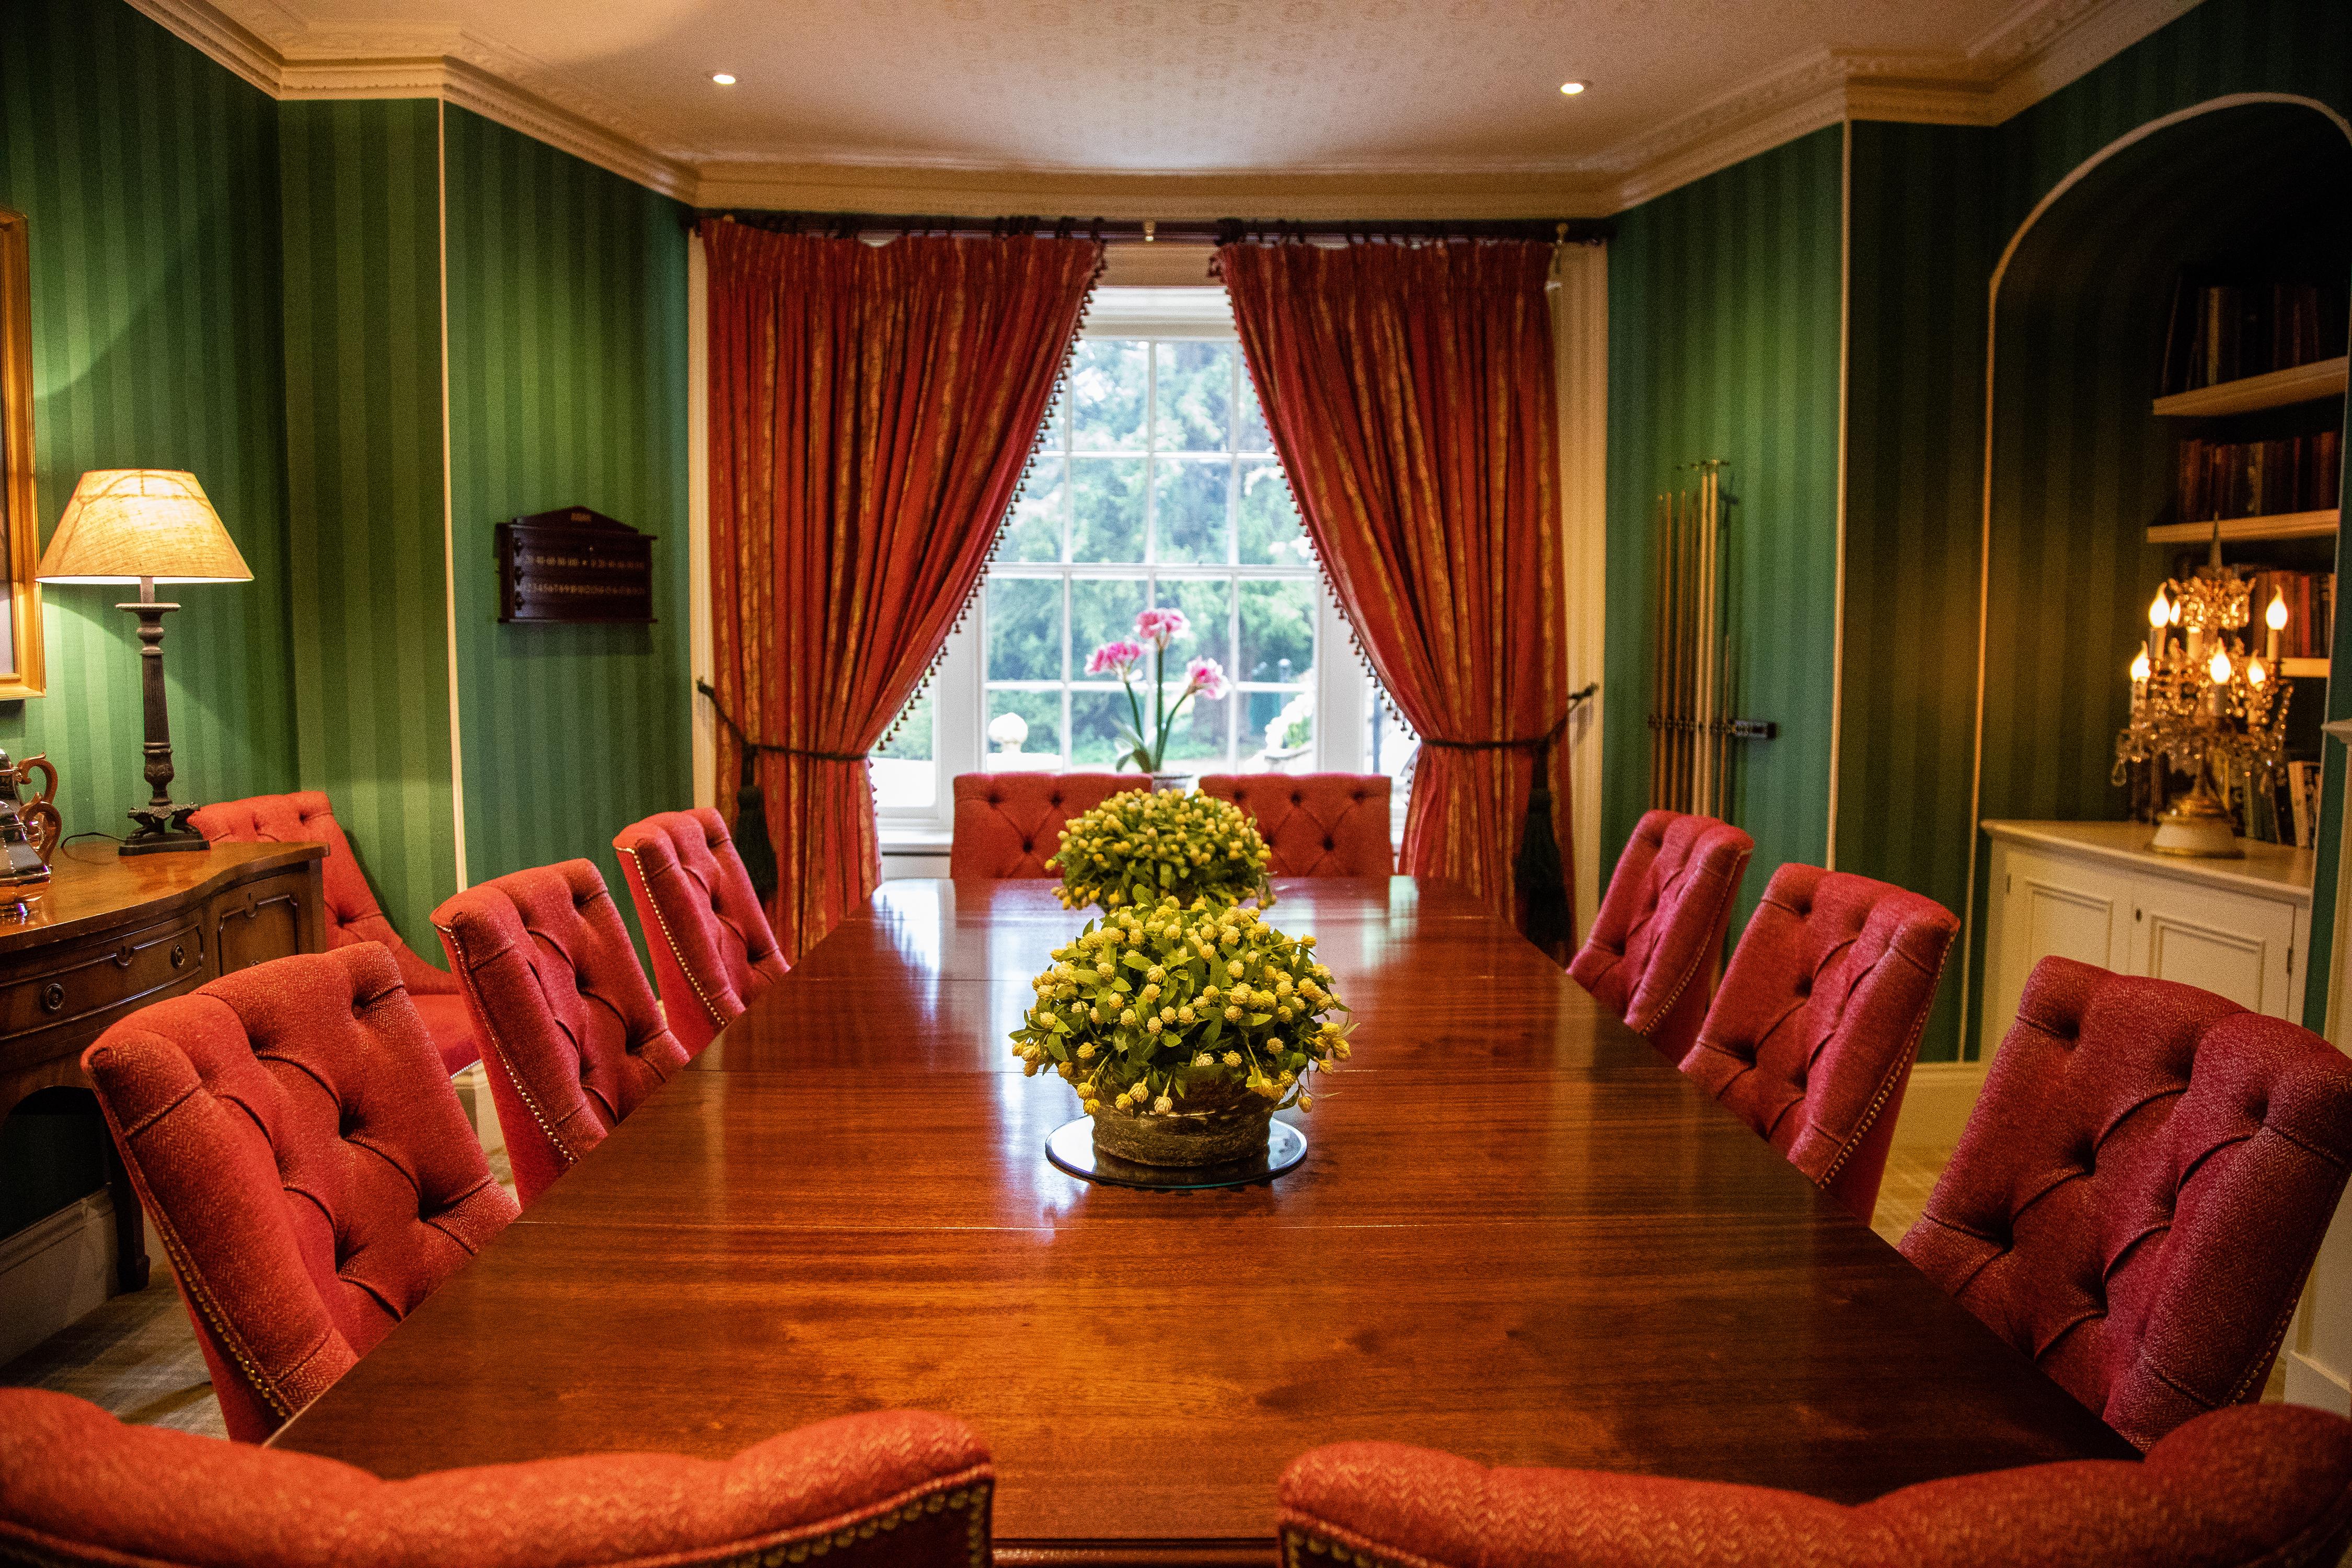 restaurant sherborne dorset luxury accomodation spa private dining